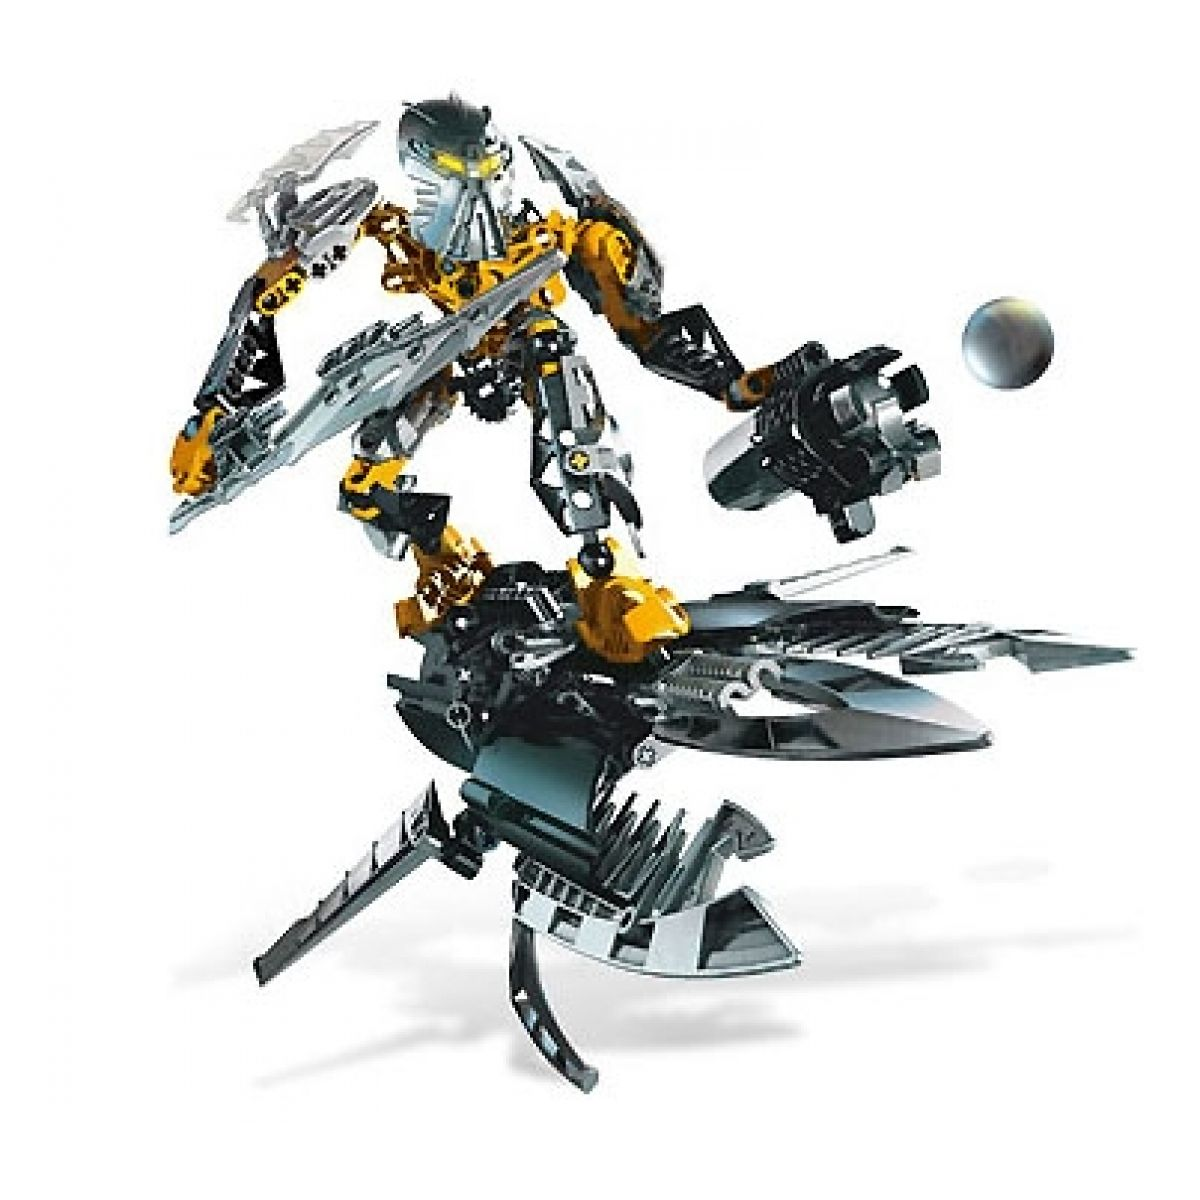 LEGO BIONICLE 8697 Toa Ignika